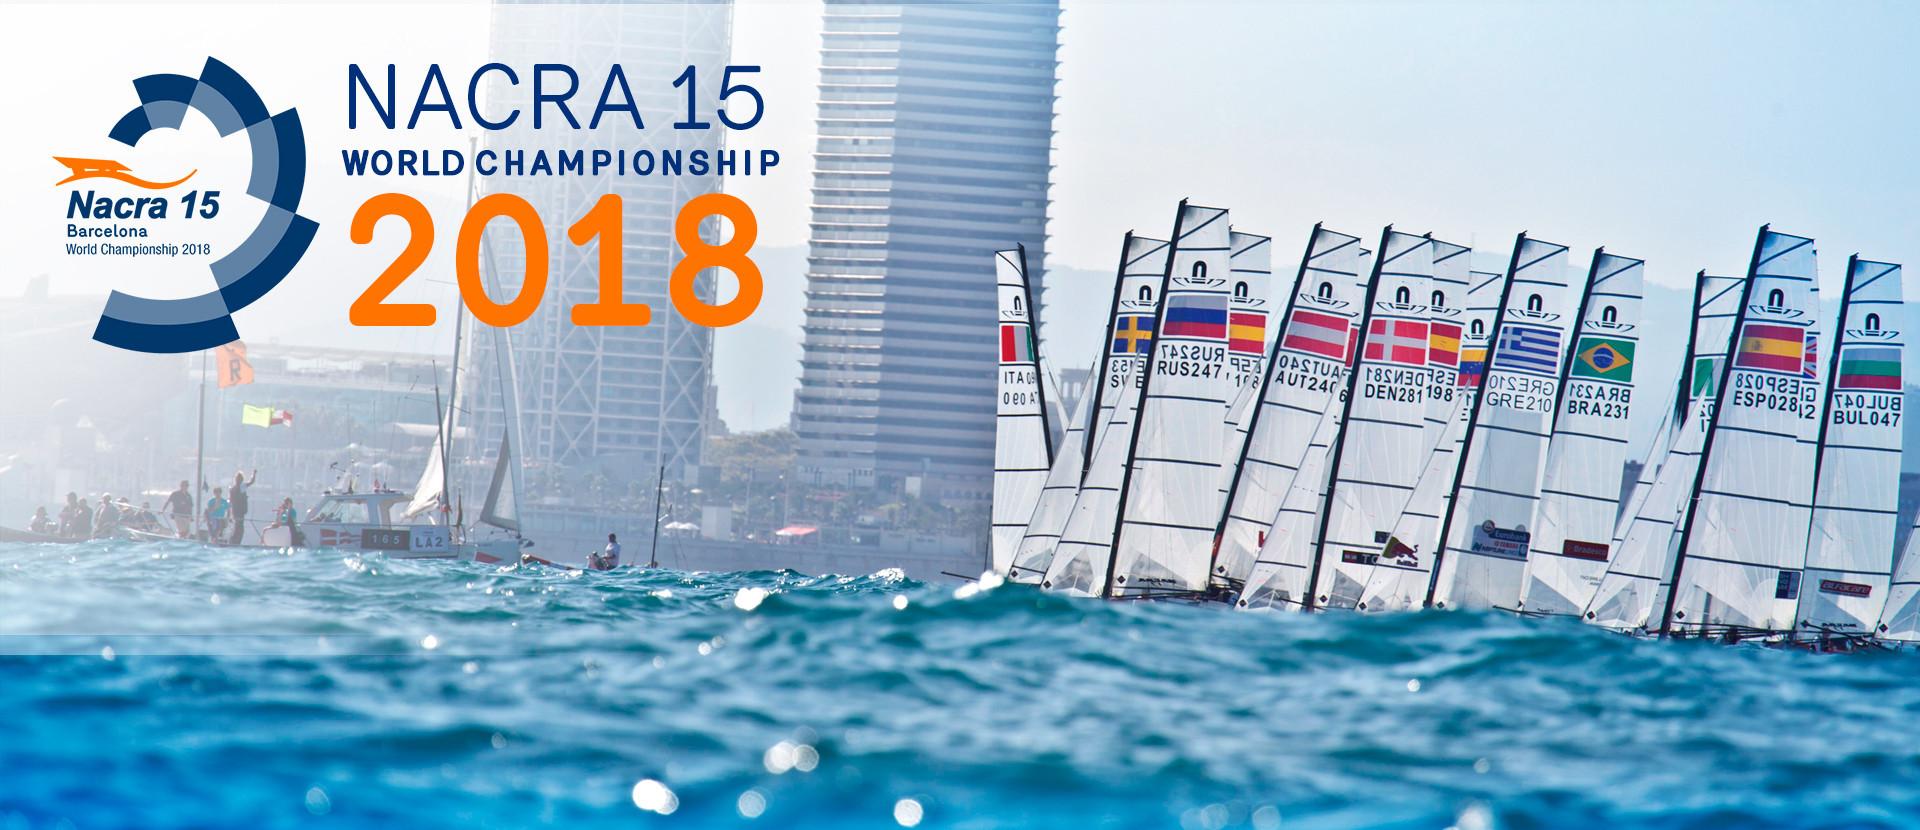 Lack of wind postpones start of inaugural Nacra 15 World Championships in Barcelona